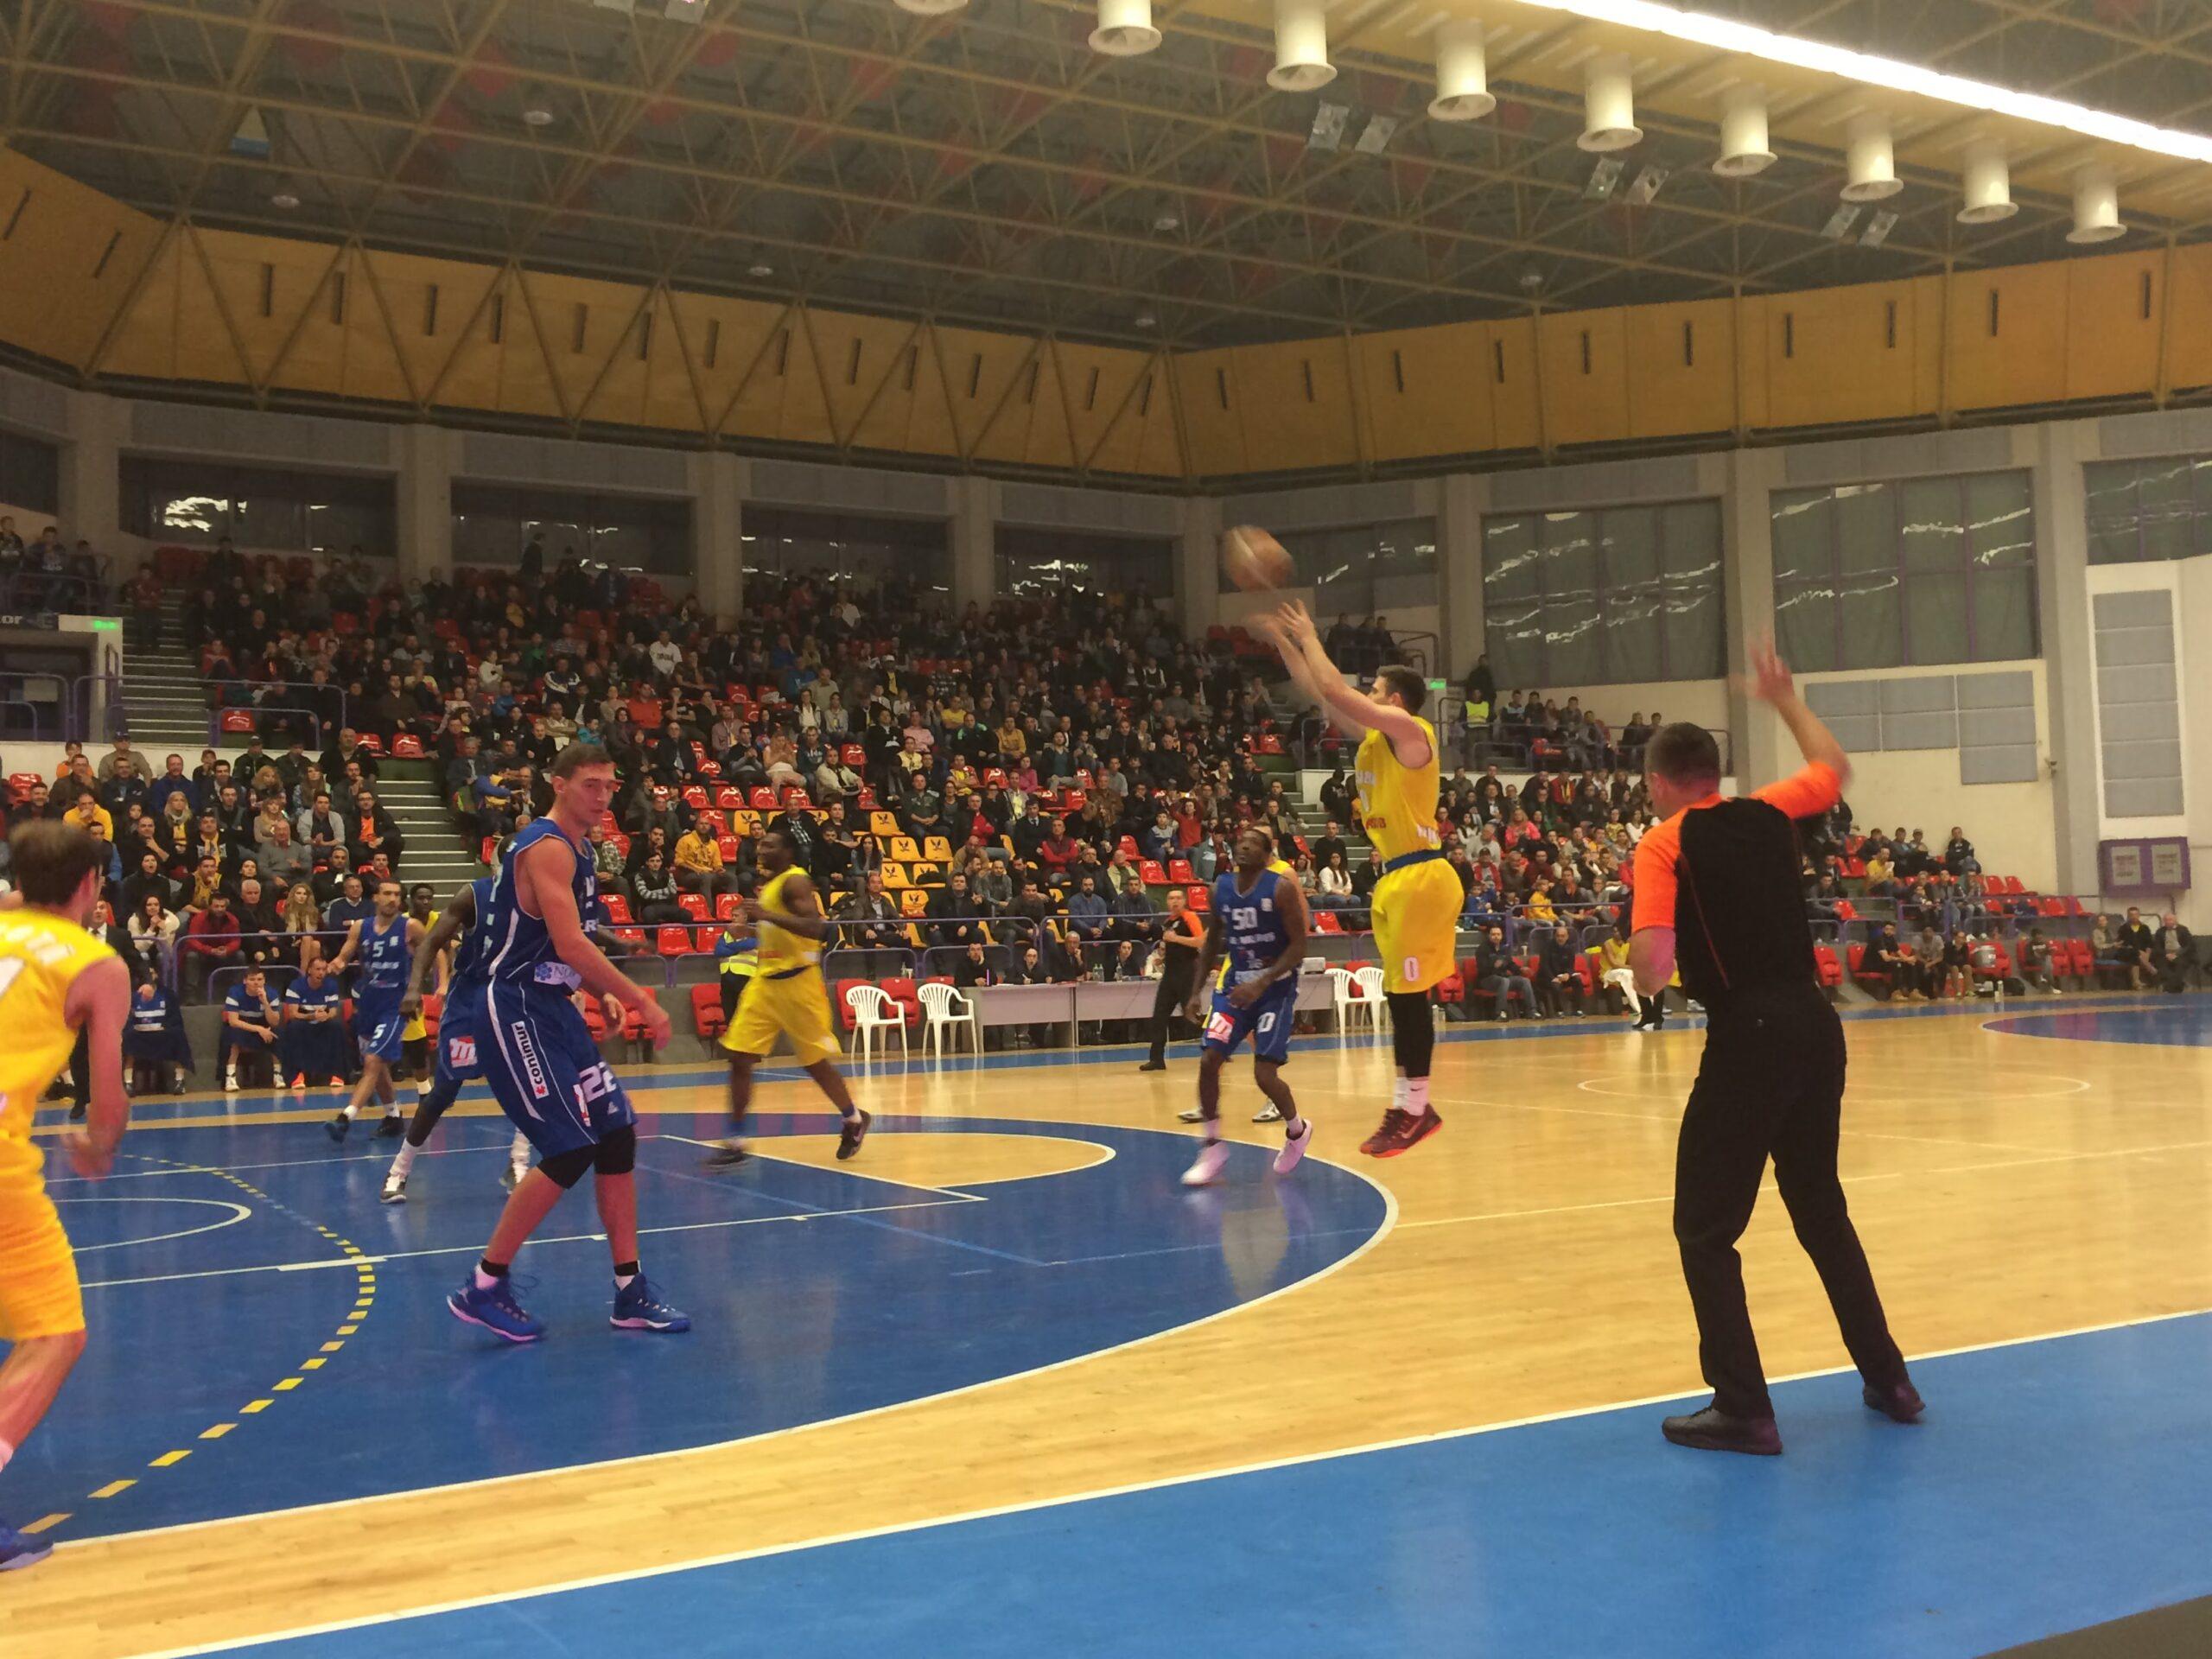 Victorie din a sasea incercare! CSU Sibiu a invins Tg. Mures